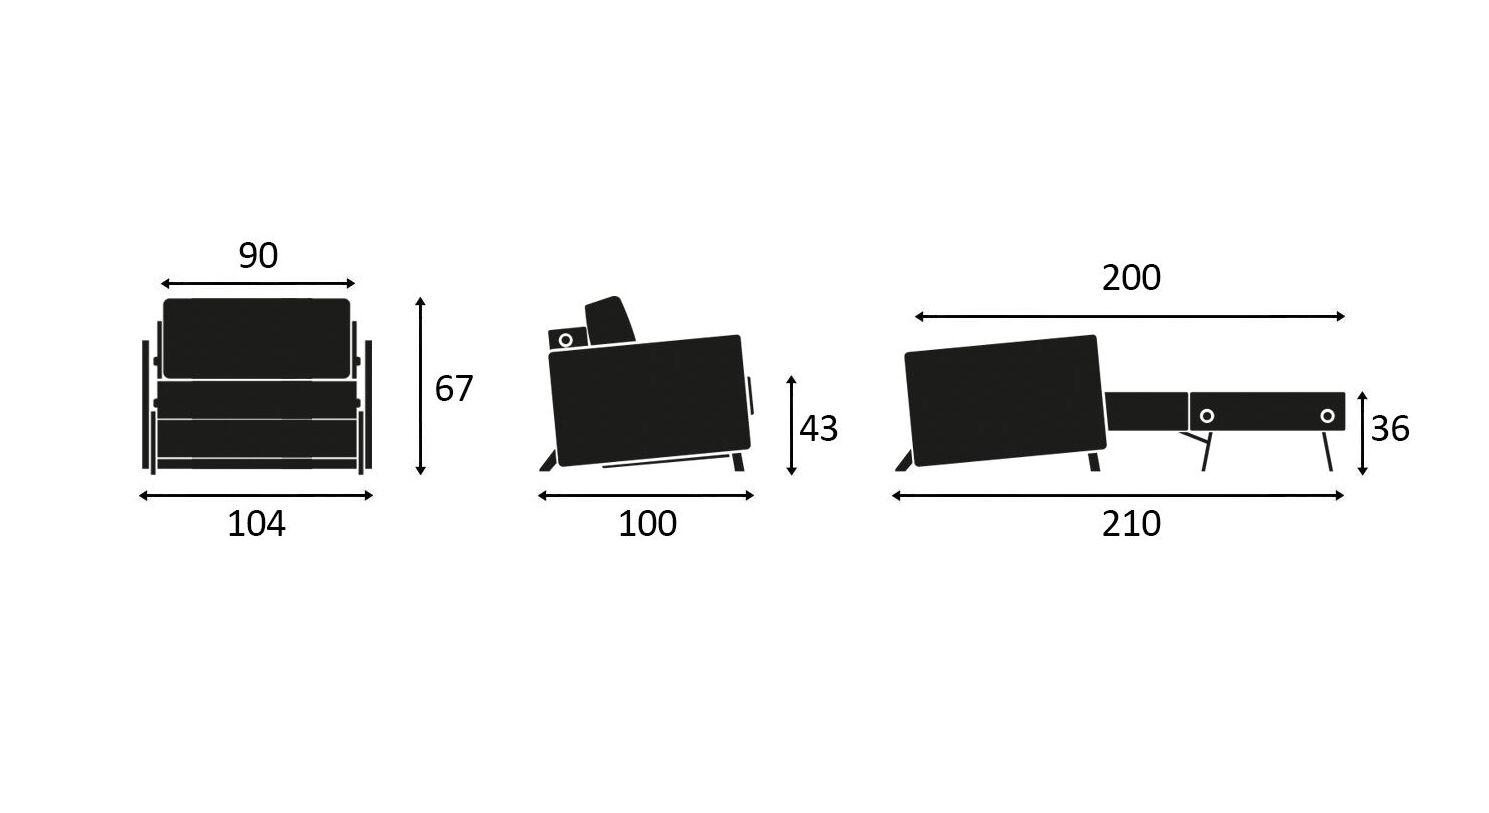 Maßgrafik zum Schlafsofa Kuda in 90 cm Breite